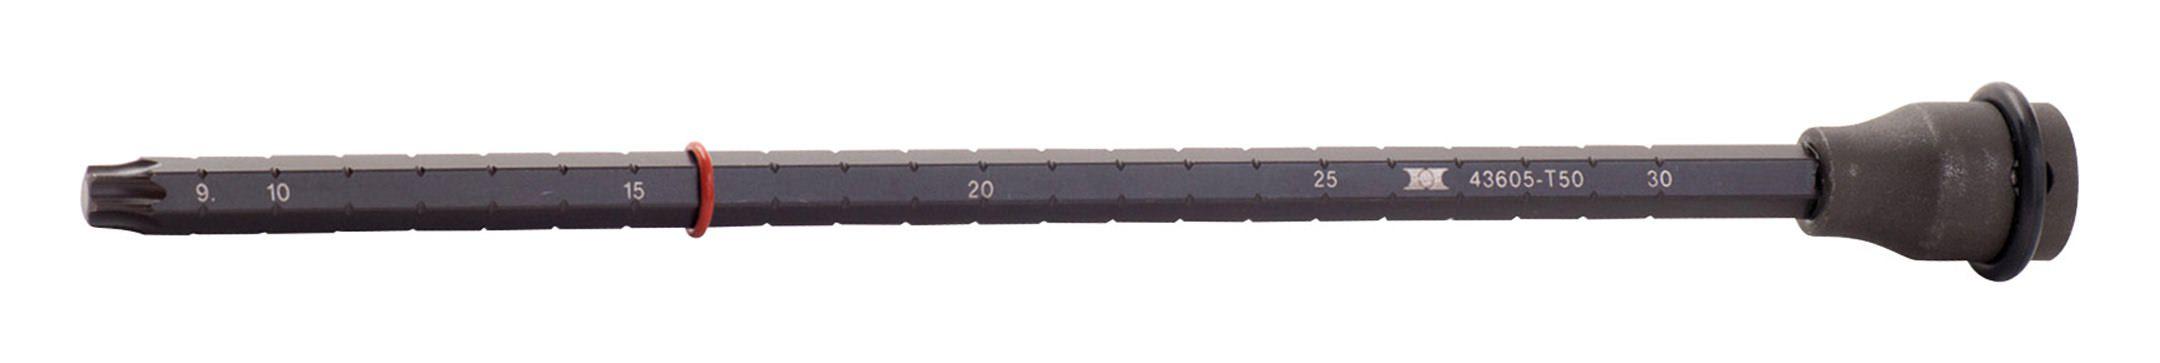 HECO Setzwerkzeuge MMS-TC T-50 - 43605